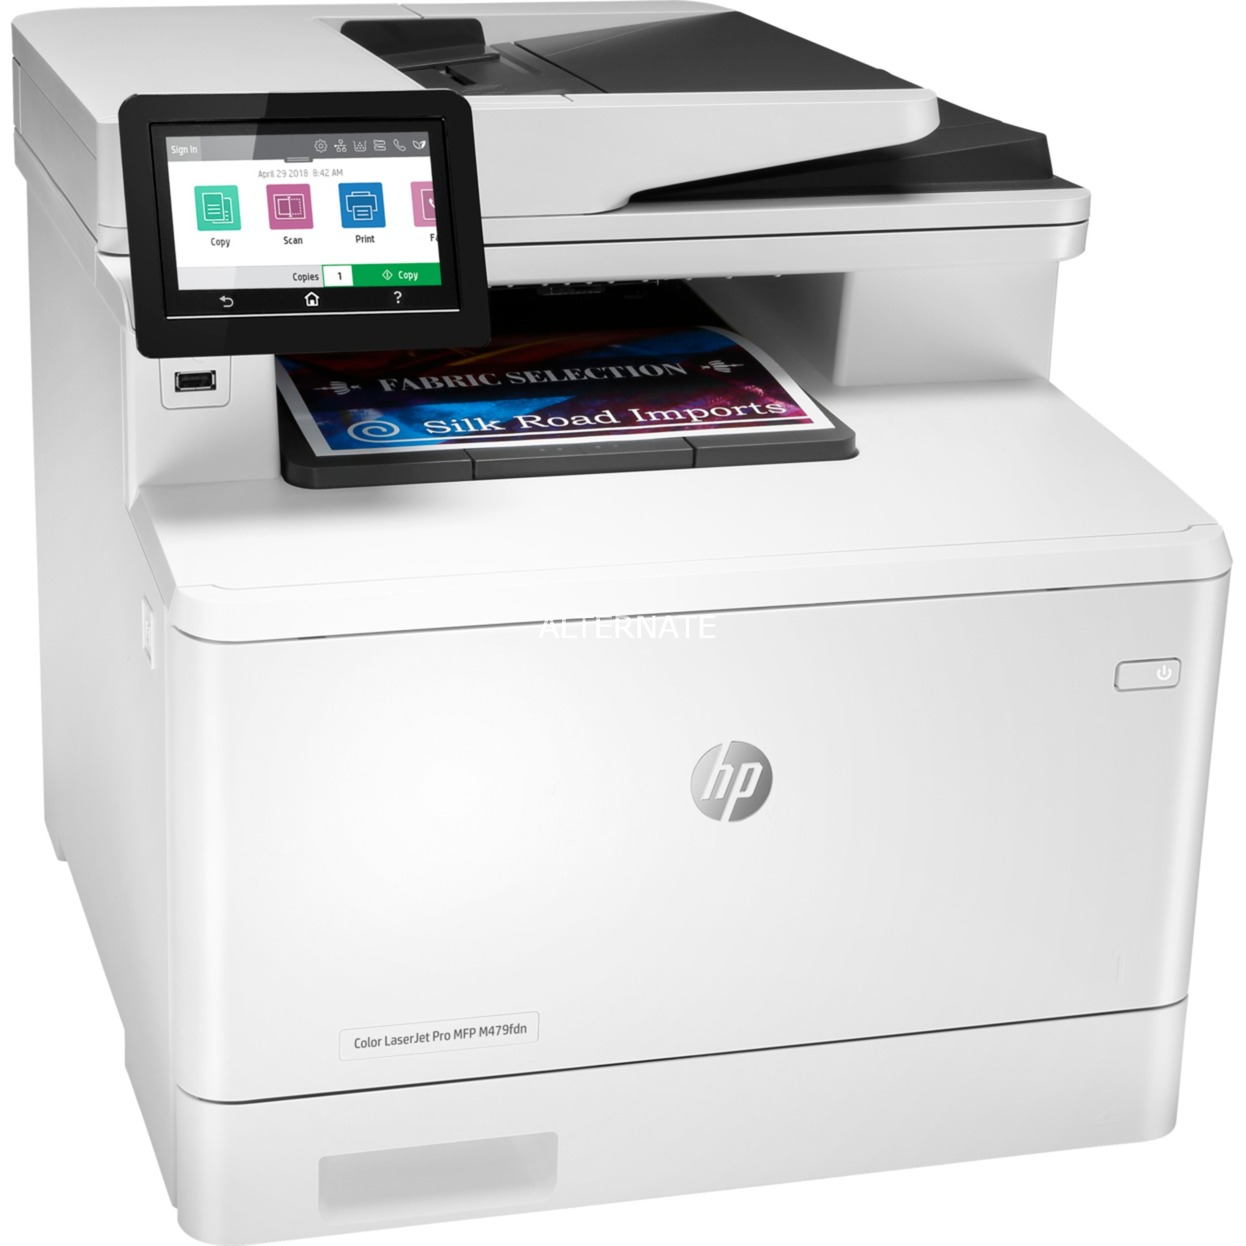 Color LaserJet Pro M479fdn Laser 28 ppm 600 x 600 DPI A4, Impresora multifuncional